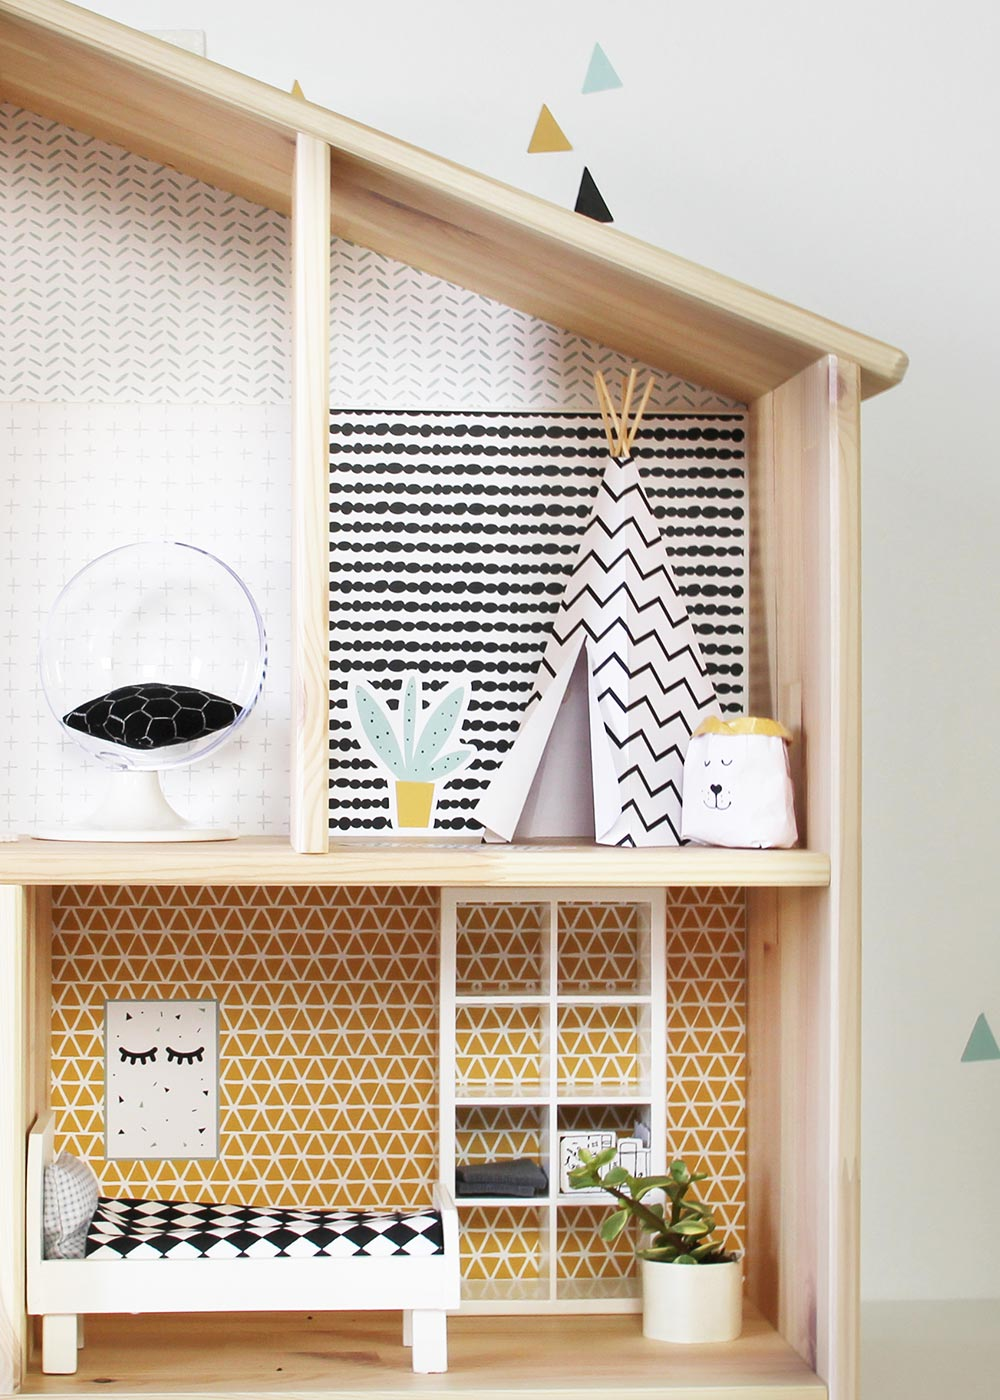 Ikea Flisat Puppenhaus Tapete Lille Stuba mint senf Teilansicht Zelt